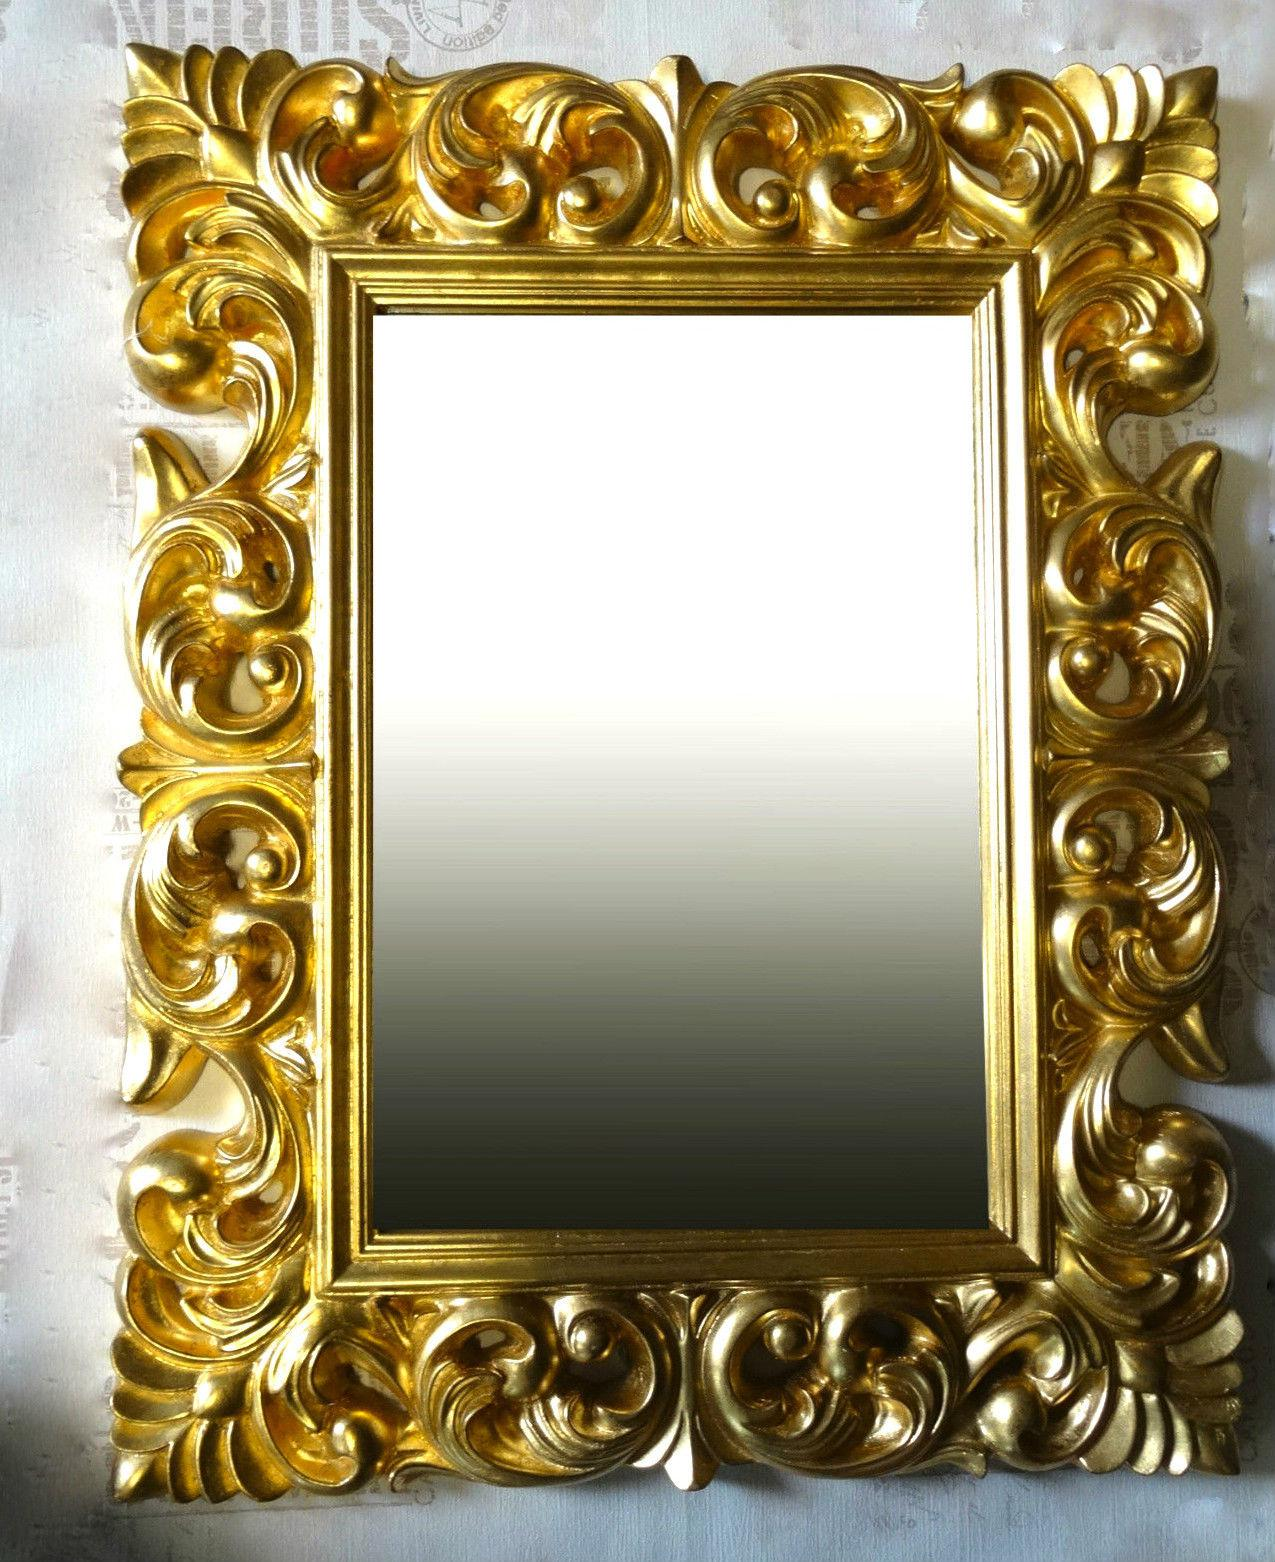 gro er barock wandspiegel ornament 70x90 standspiegel spiegel gold flurspiegel kaufen bei. Black Bedroom Furniture Sets. Home Design Ideas